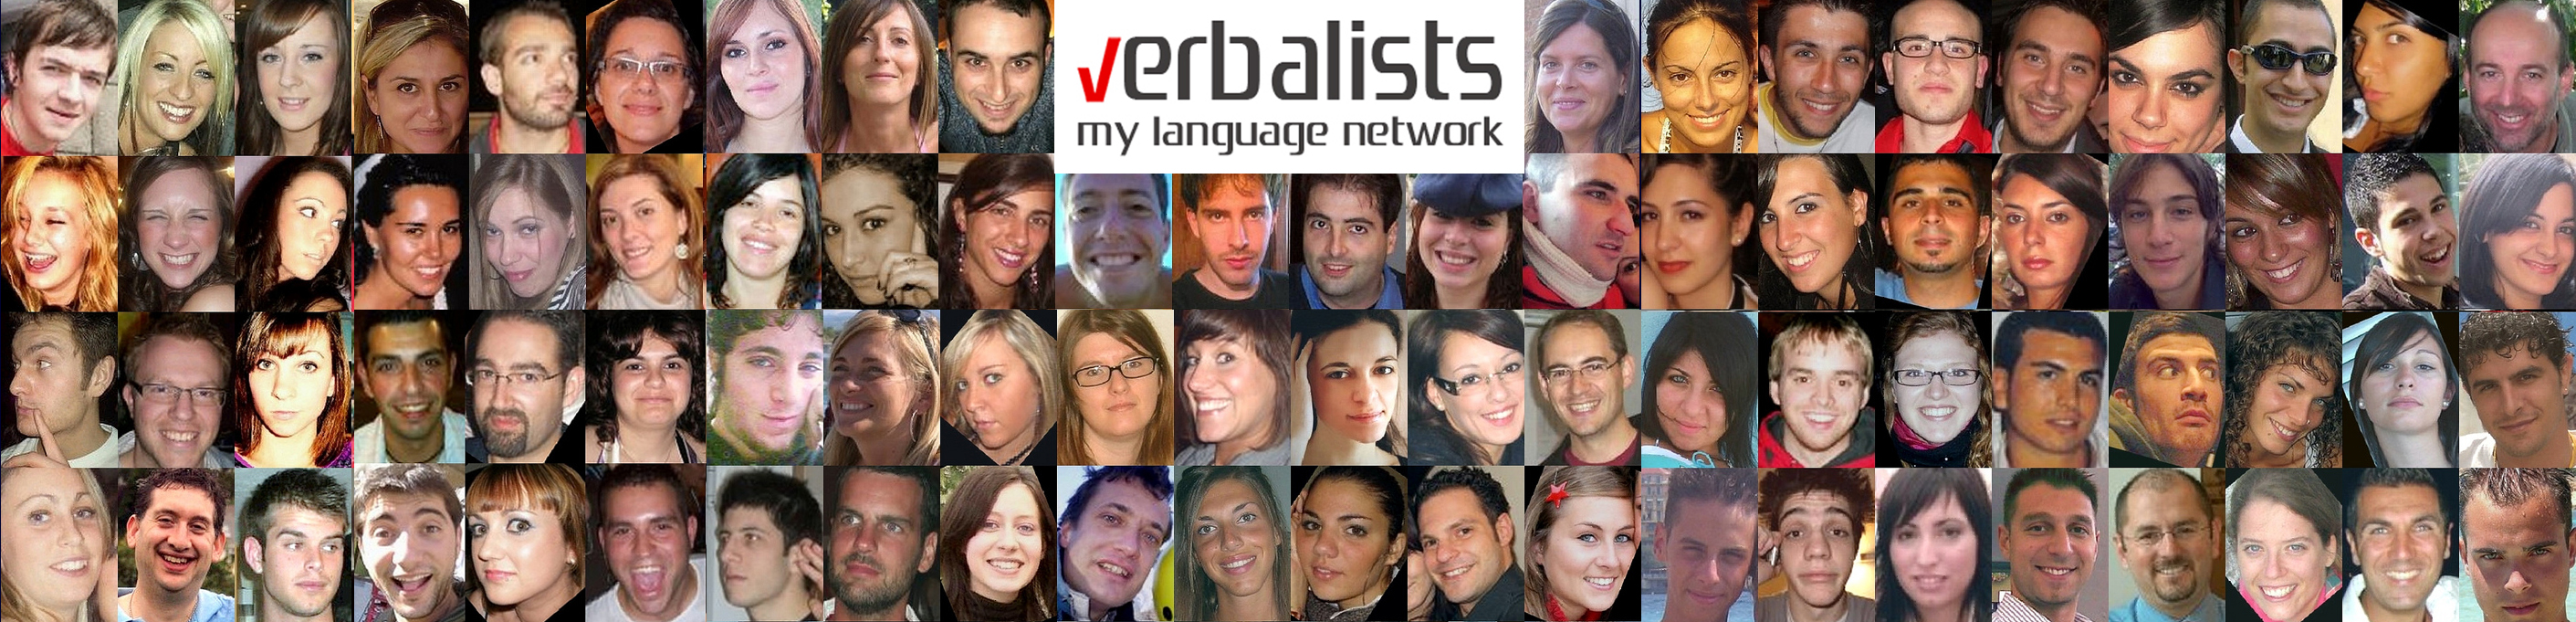 Verbalists Language Network